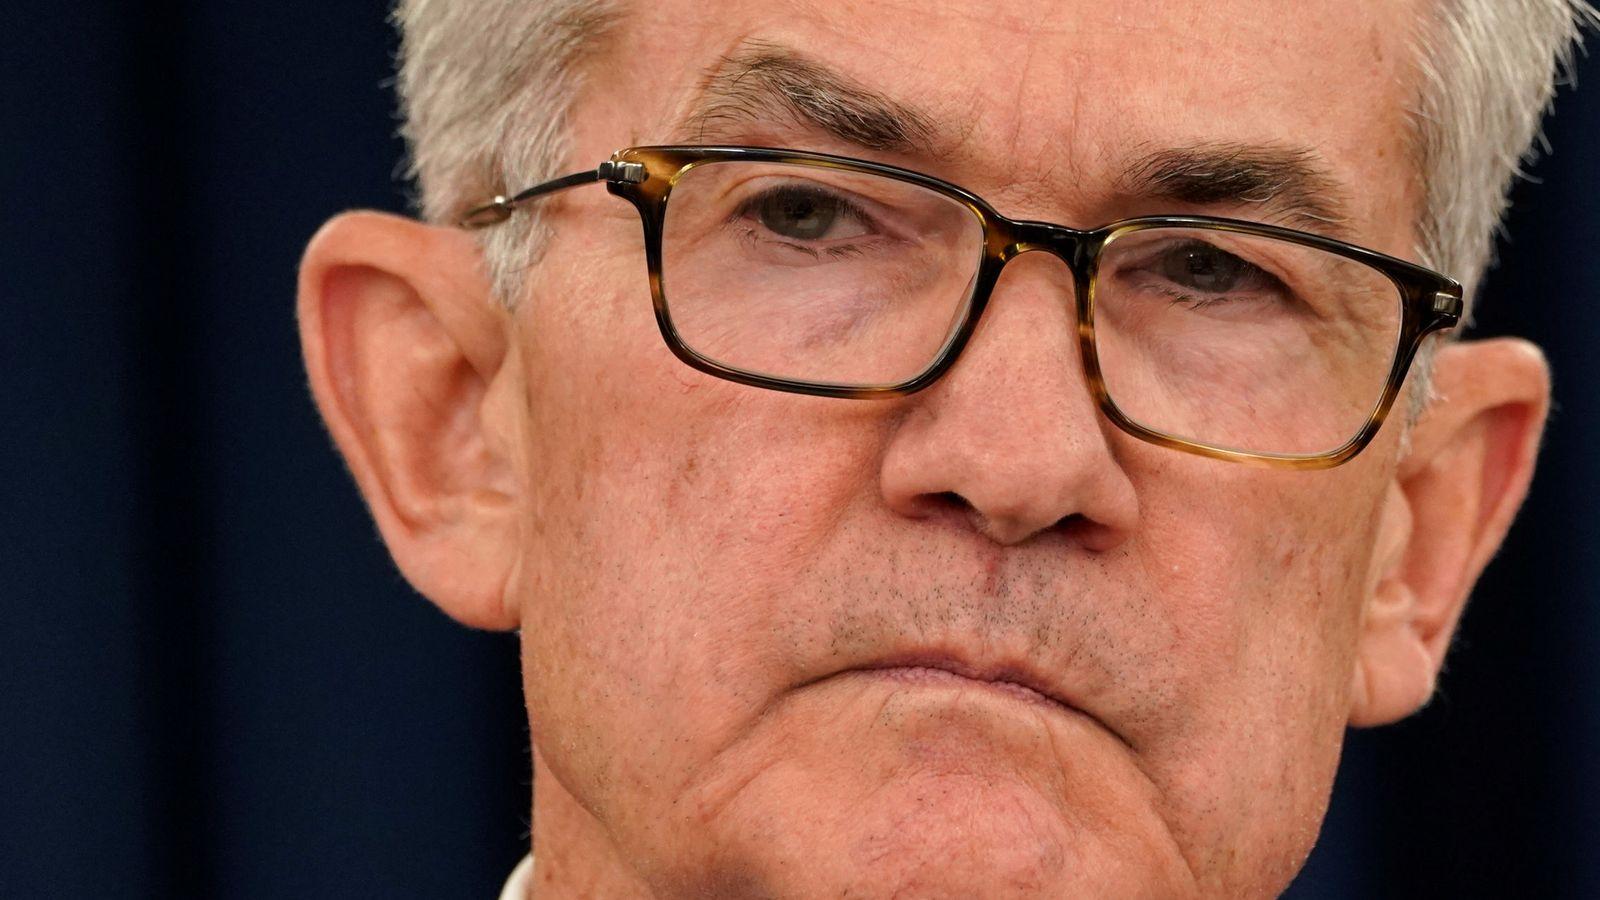 Foto: El presidente de la Reserva Federal, Jerome Powell. (Reuters)